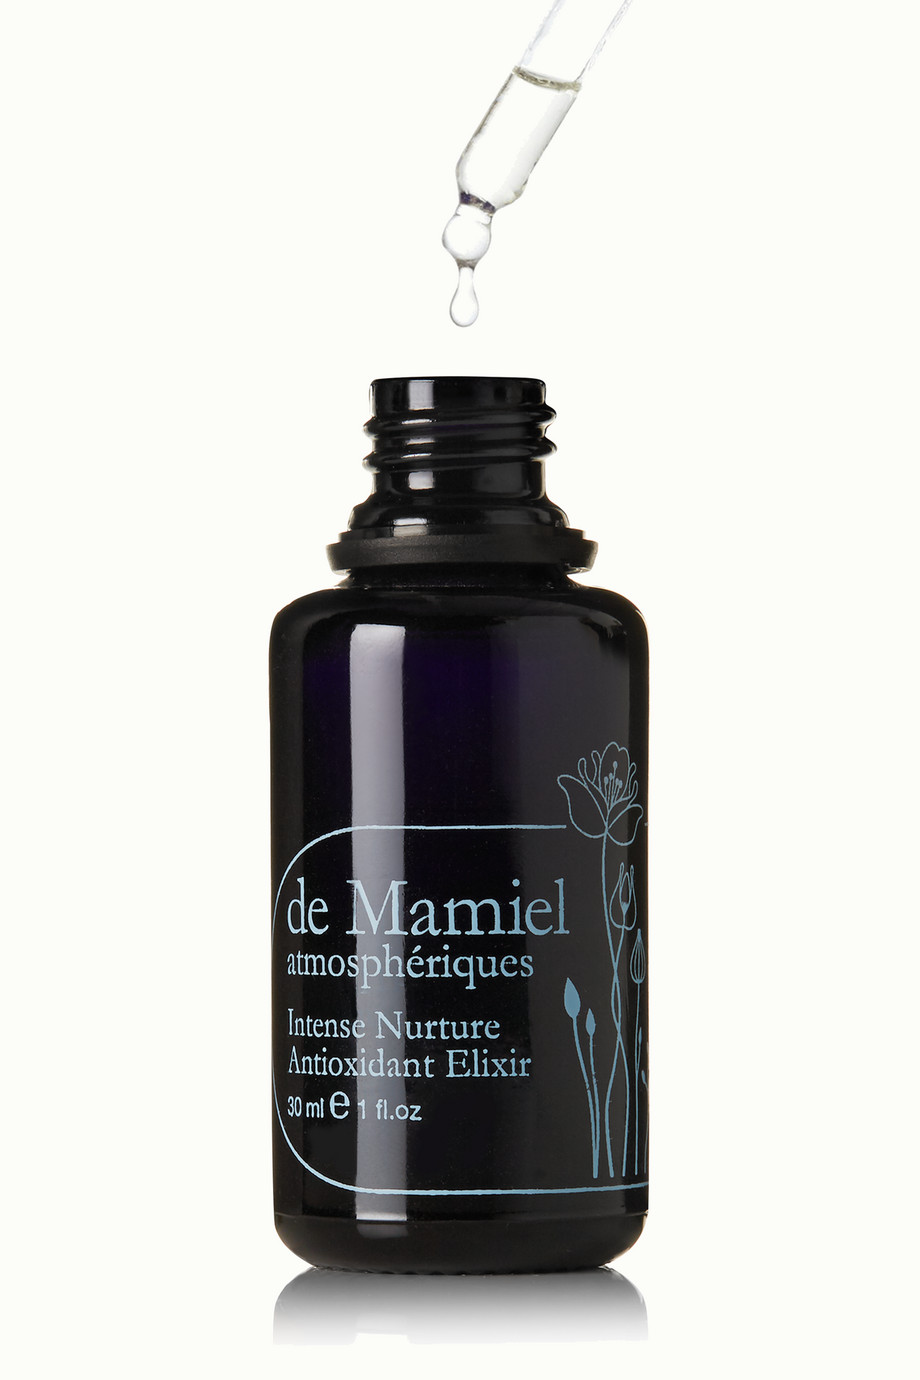 de Mamiel Intense Nurture Antioxidant Elixir, 30ml